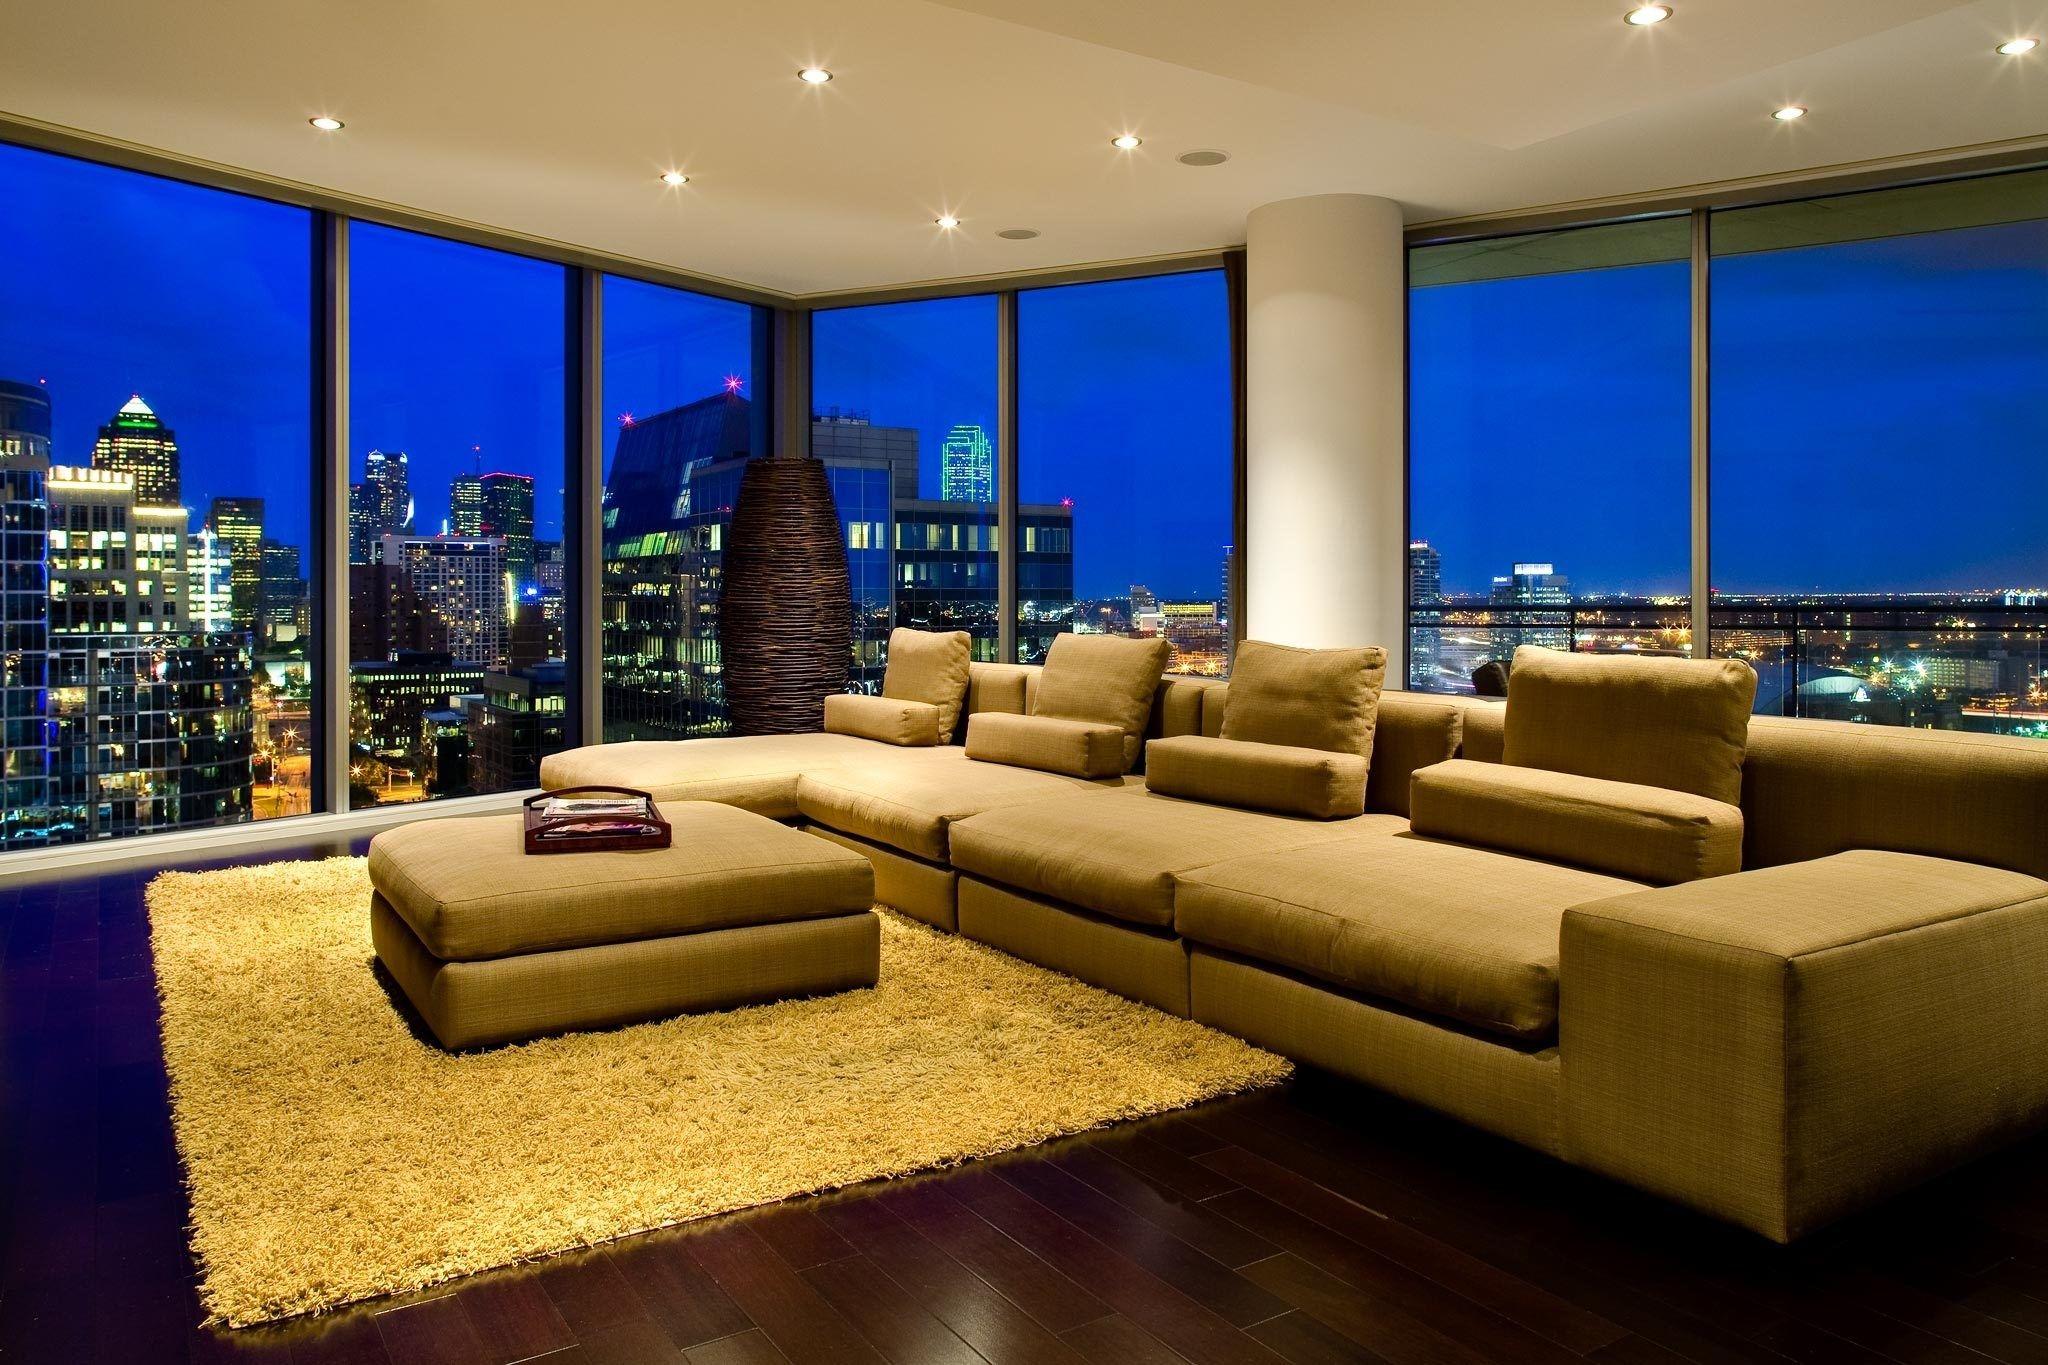 2048x1365 High Resolution Wallpaper Room Luxury Condo